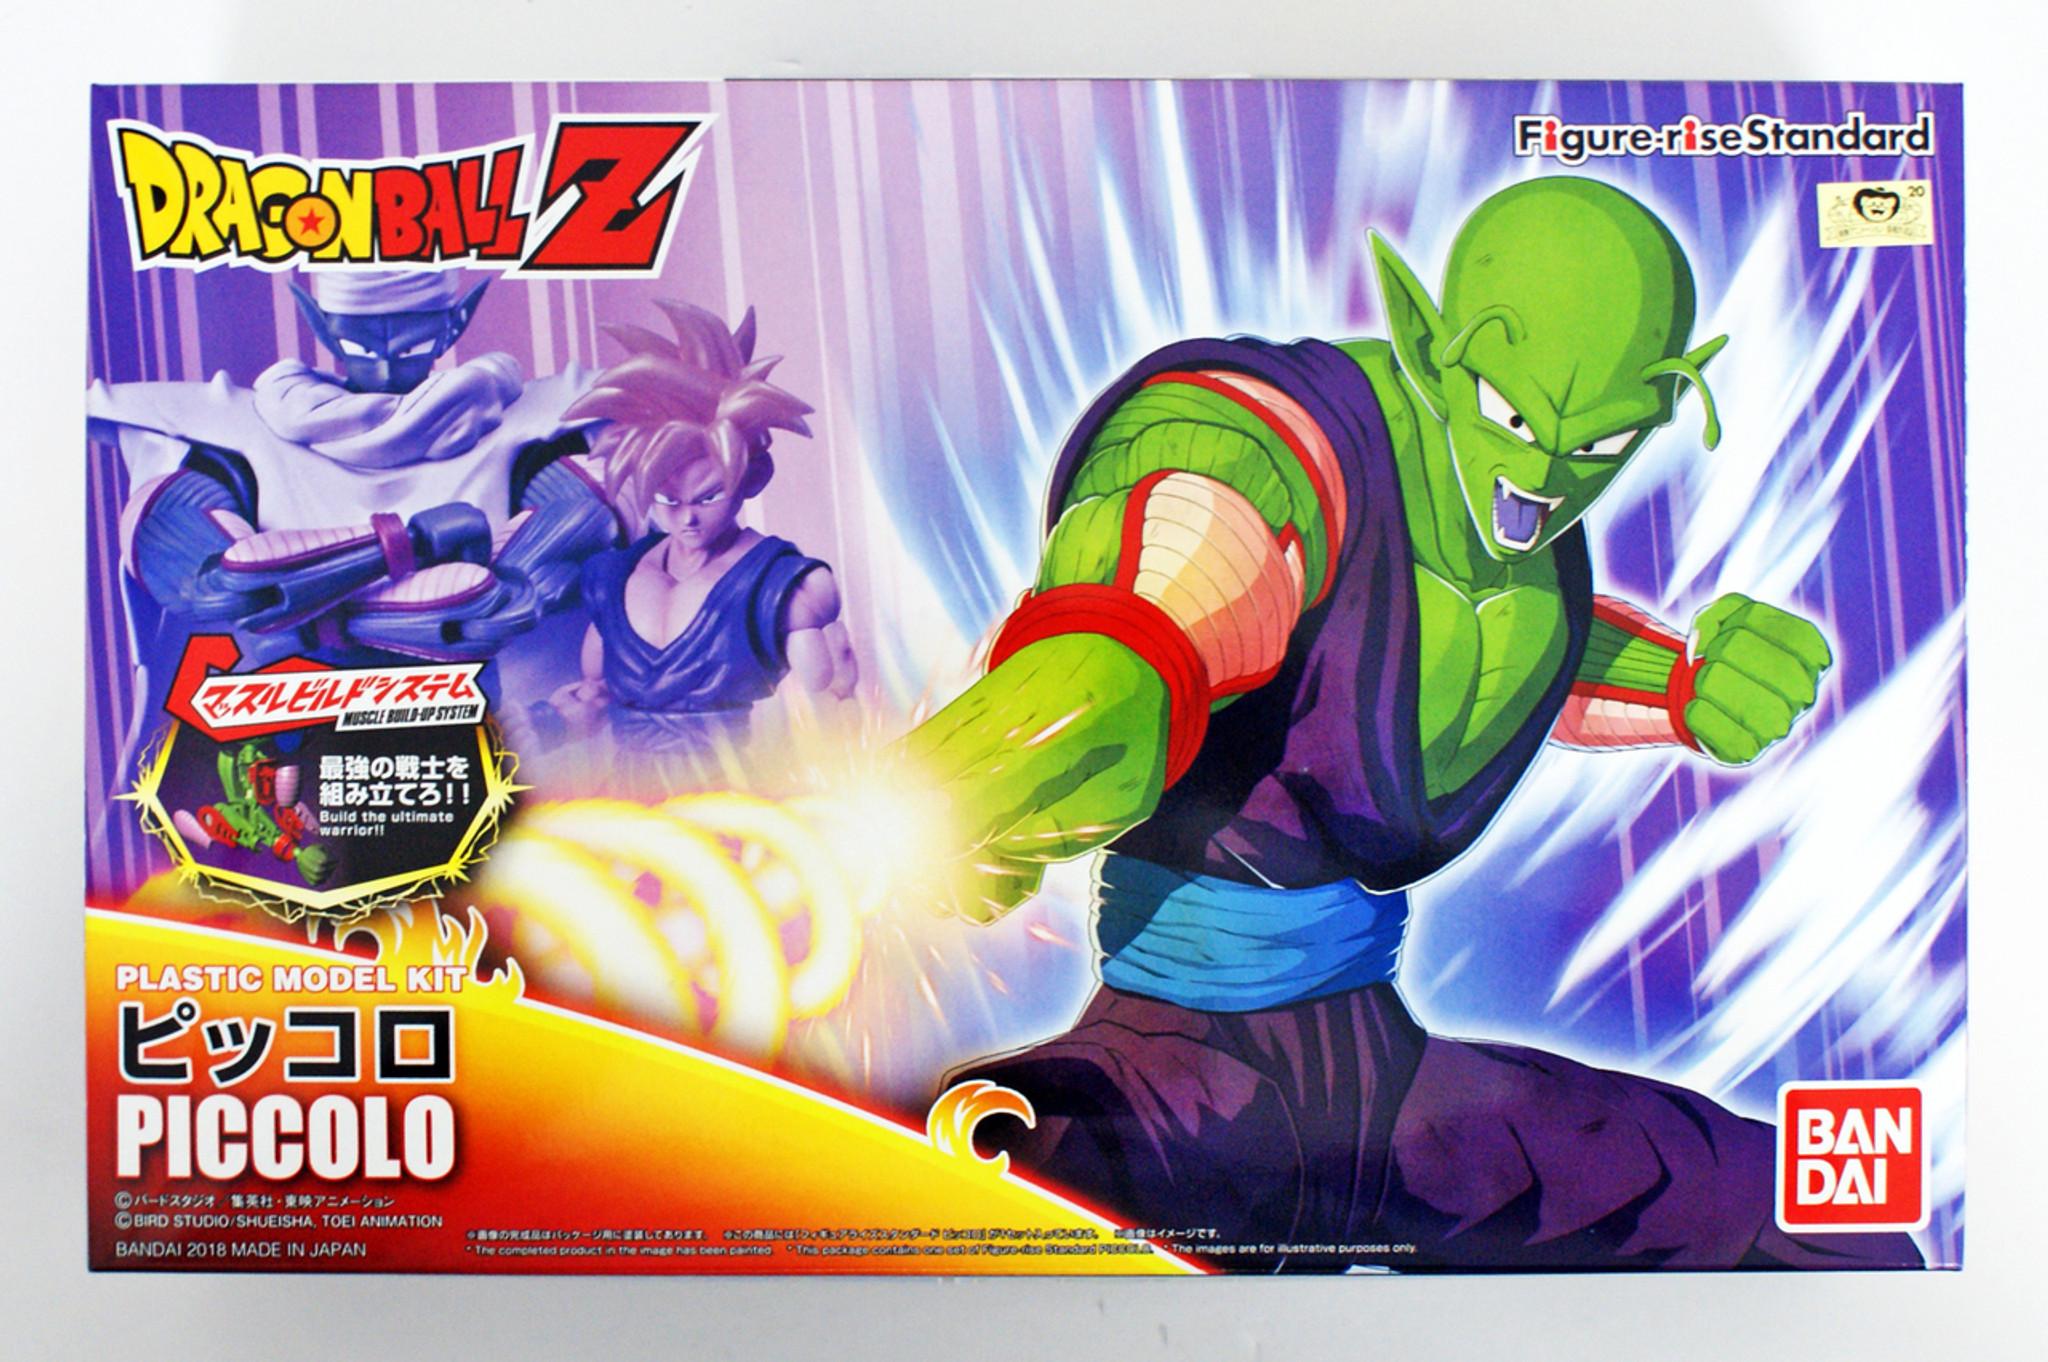 Figure-rise Standard Dragon Ball Piccolo Plastic Model Kit Bandai New From Japan Toys & Hobbies